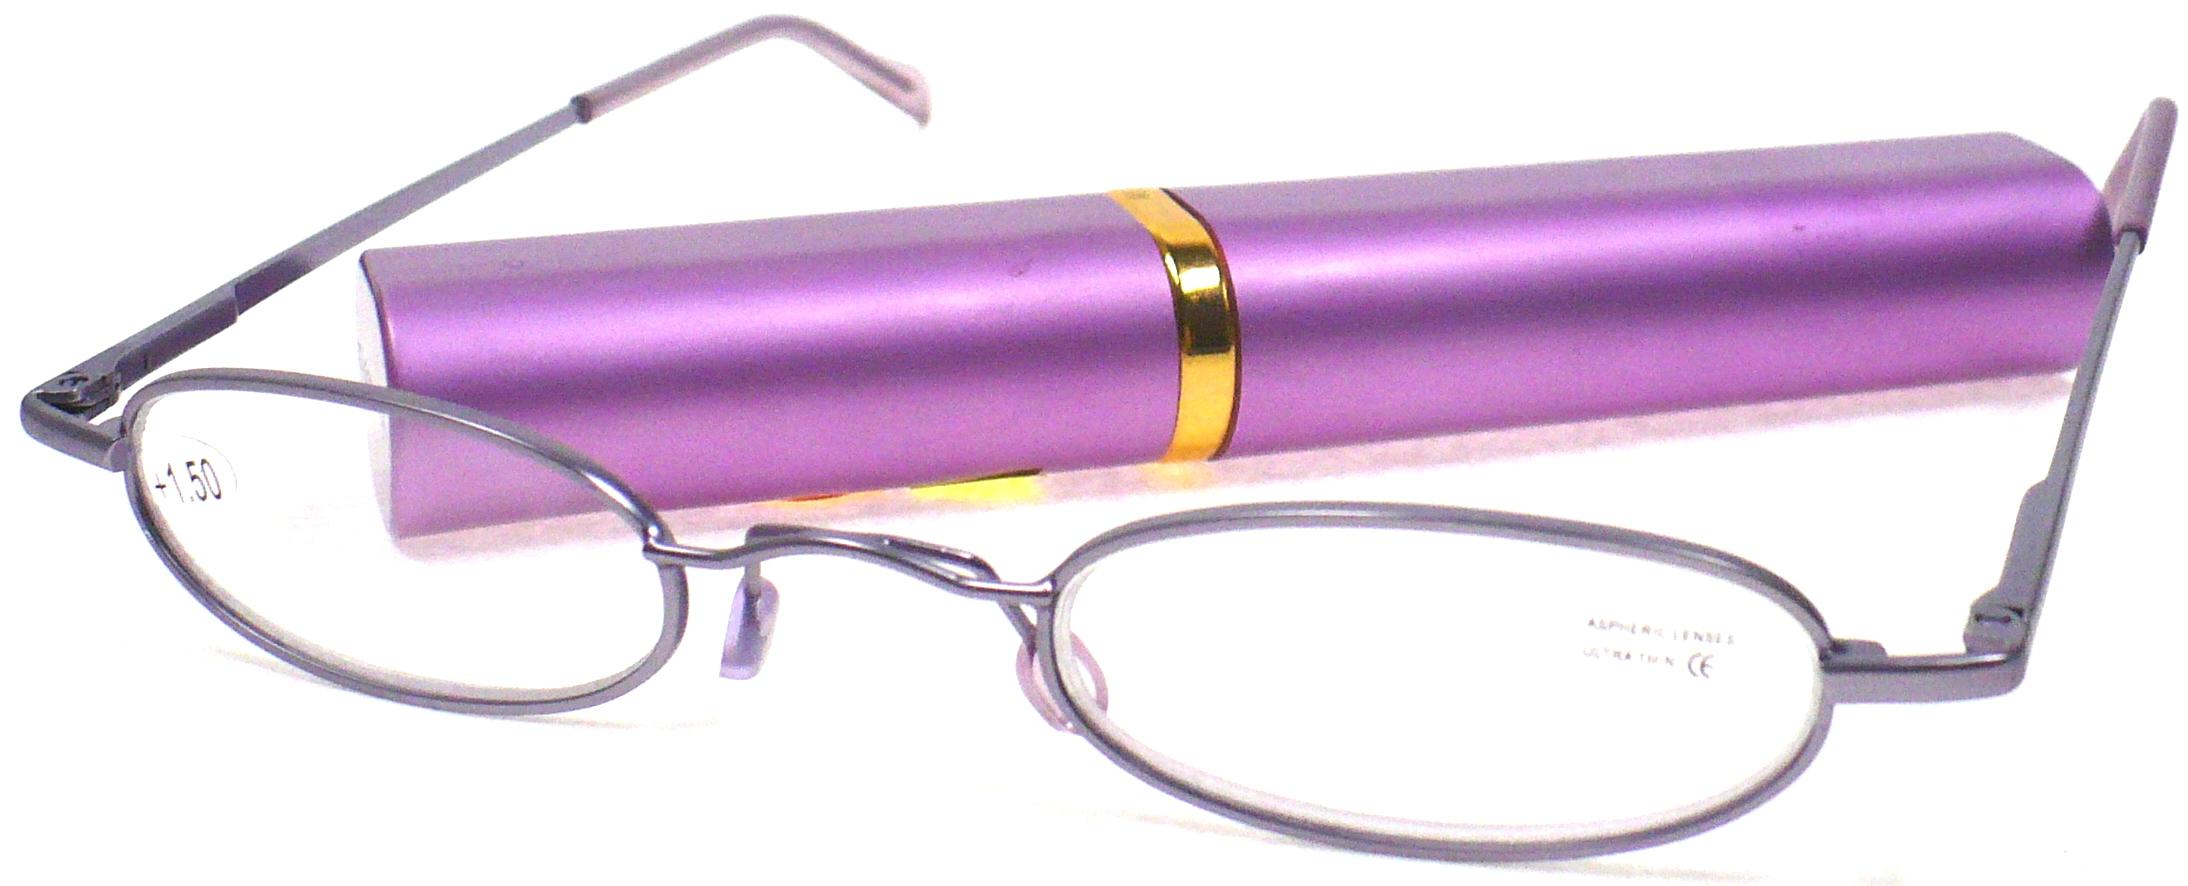 Berkeley Cleopatra čtecí dioptrické brýle +2,0 fialové v pouzdru 1 kus M160